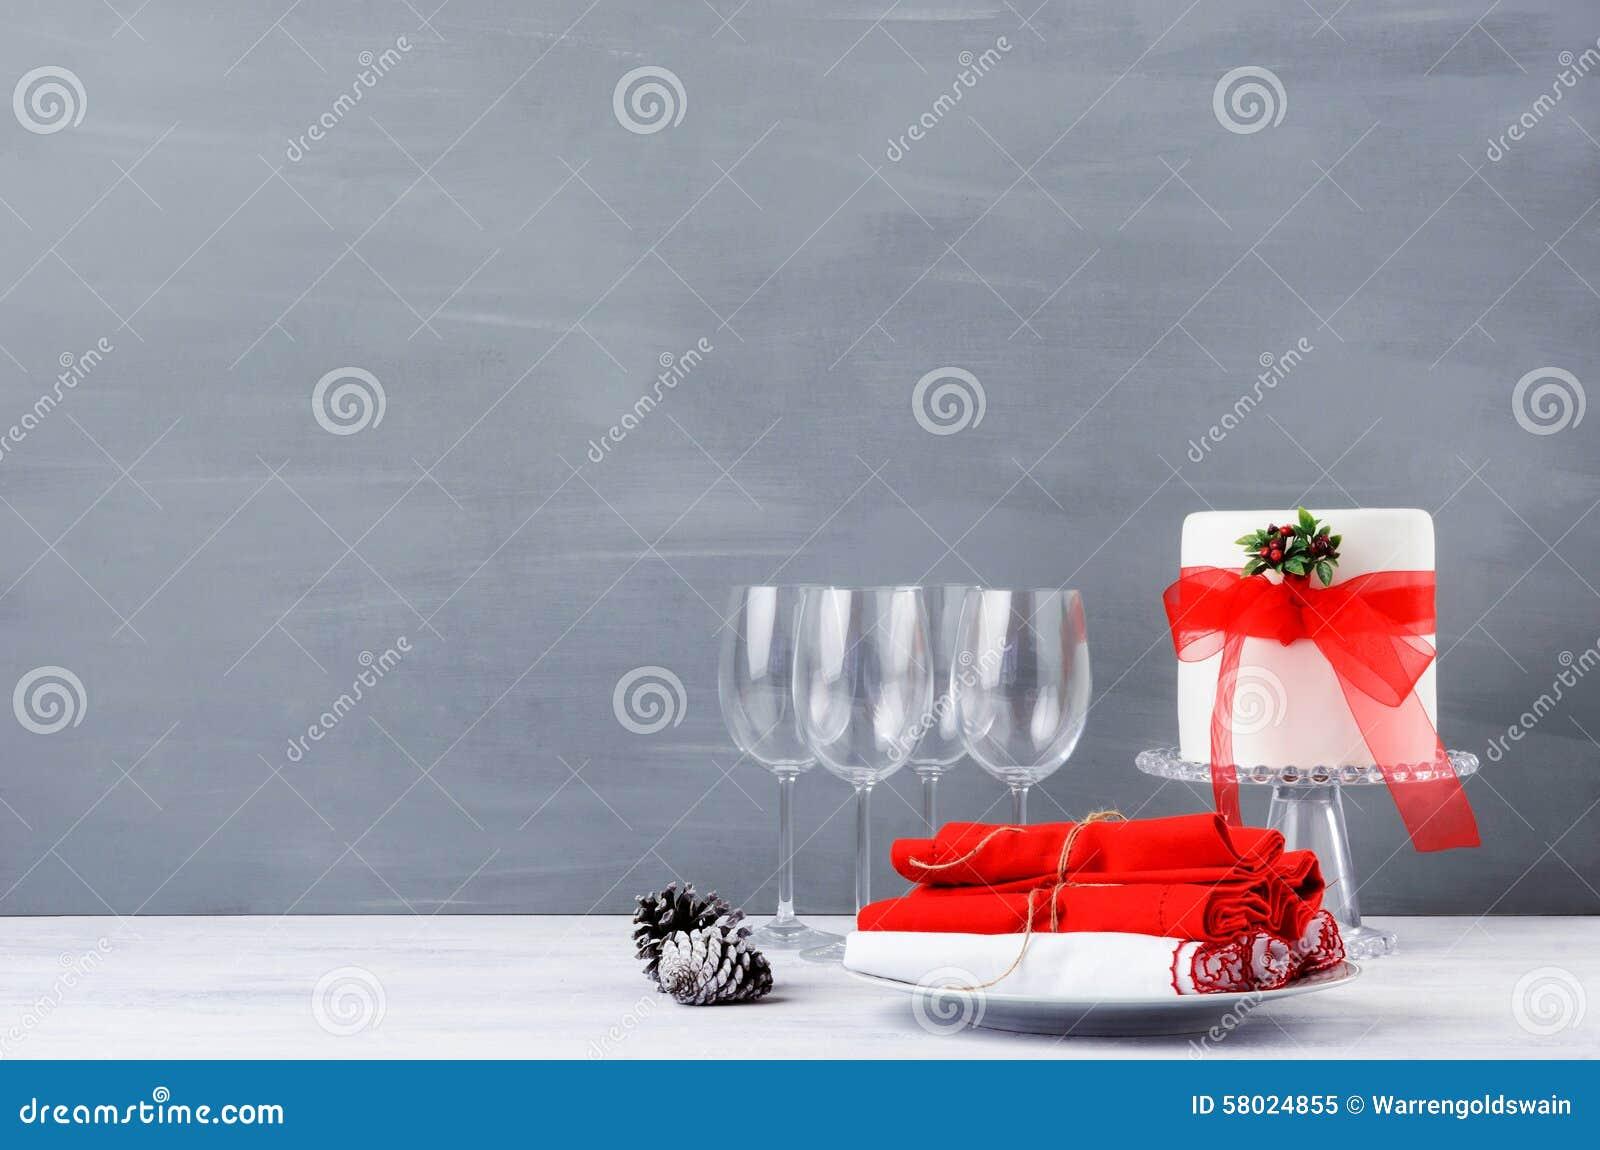 Simple minimalist christmas display table with cake stock for Minimalist christmas